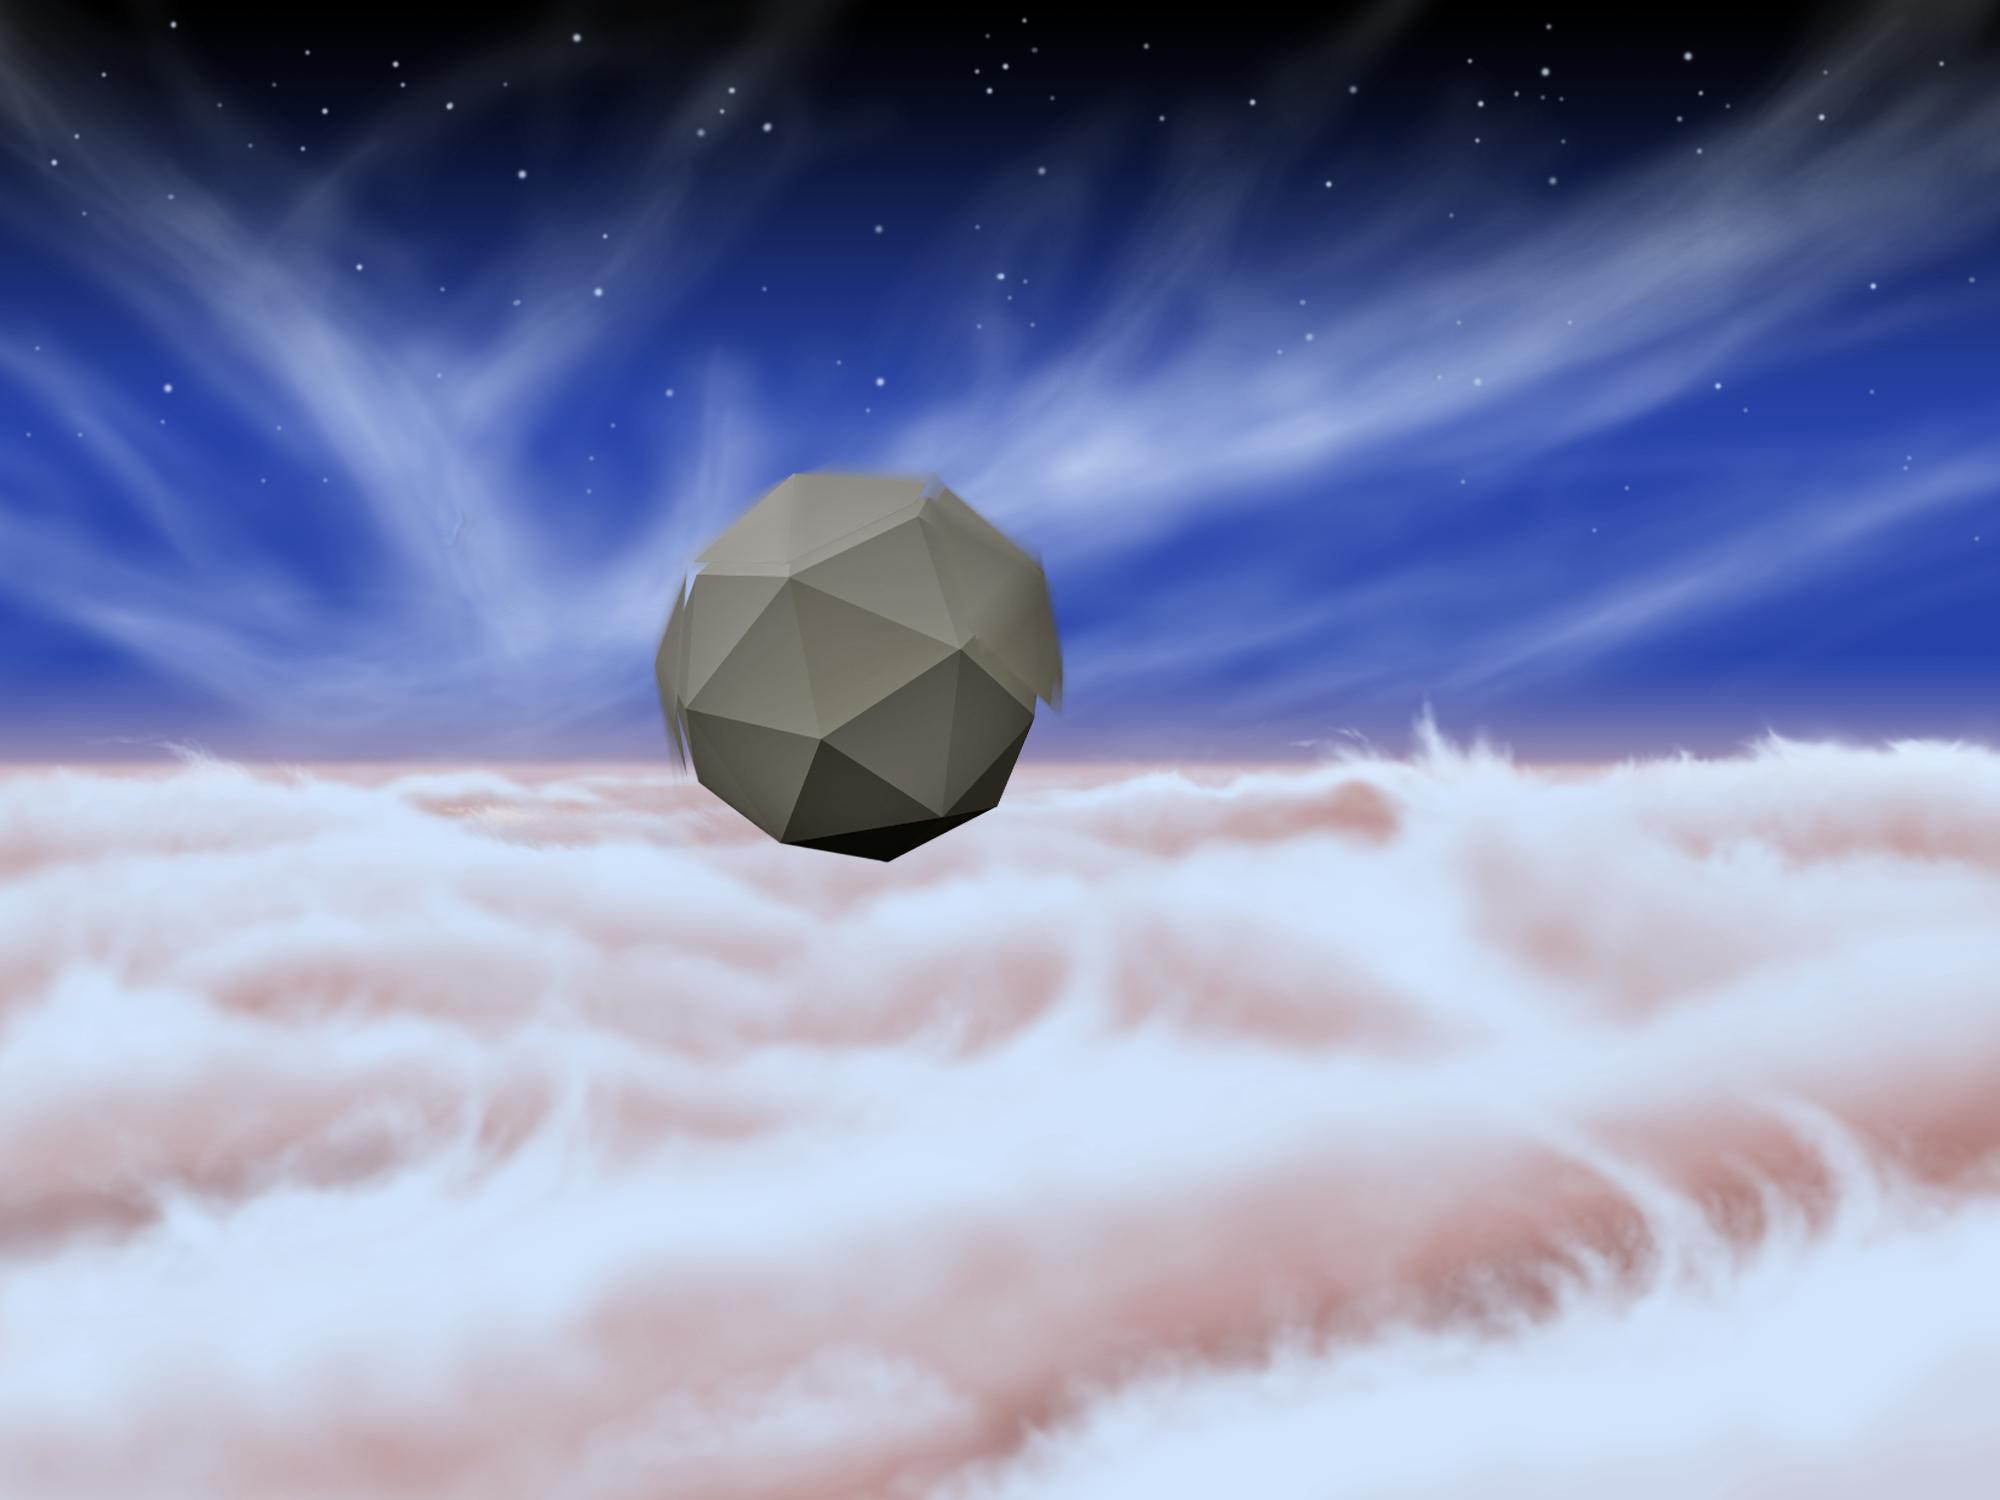 An Artist's Rendering Shows A Windbot Bobbing Through The Skies Of Jupiter